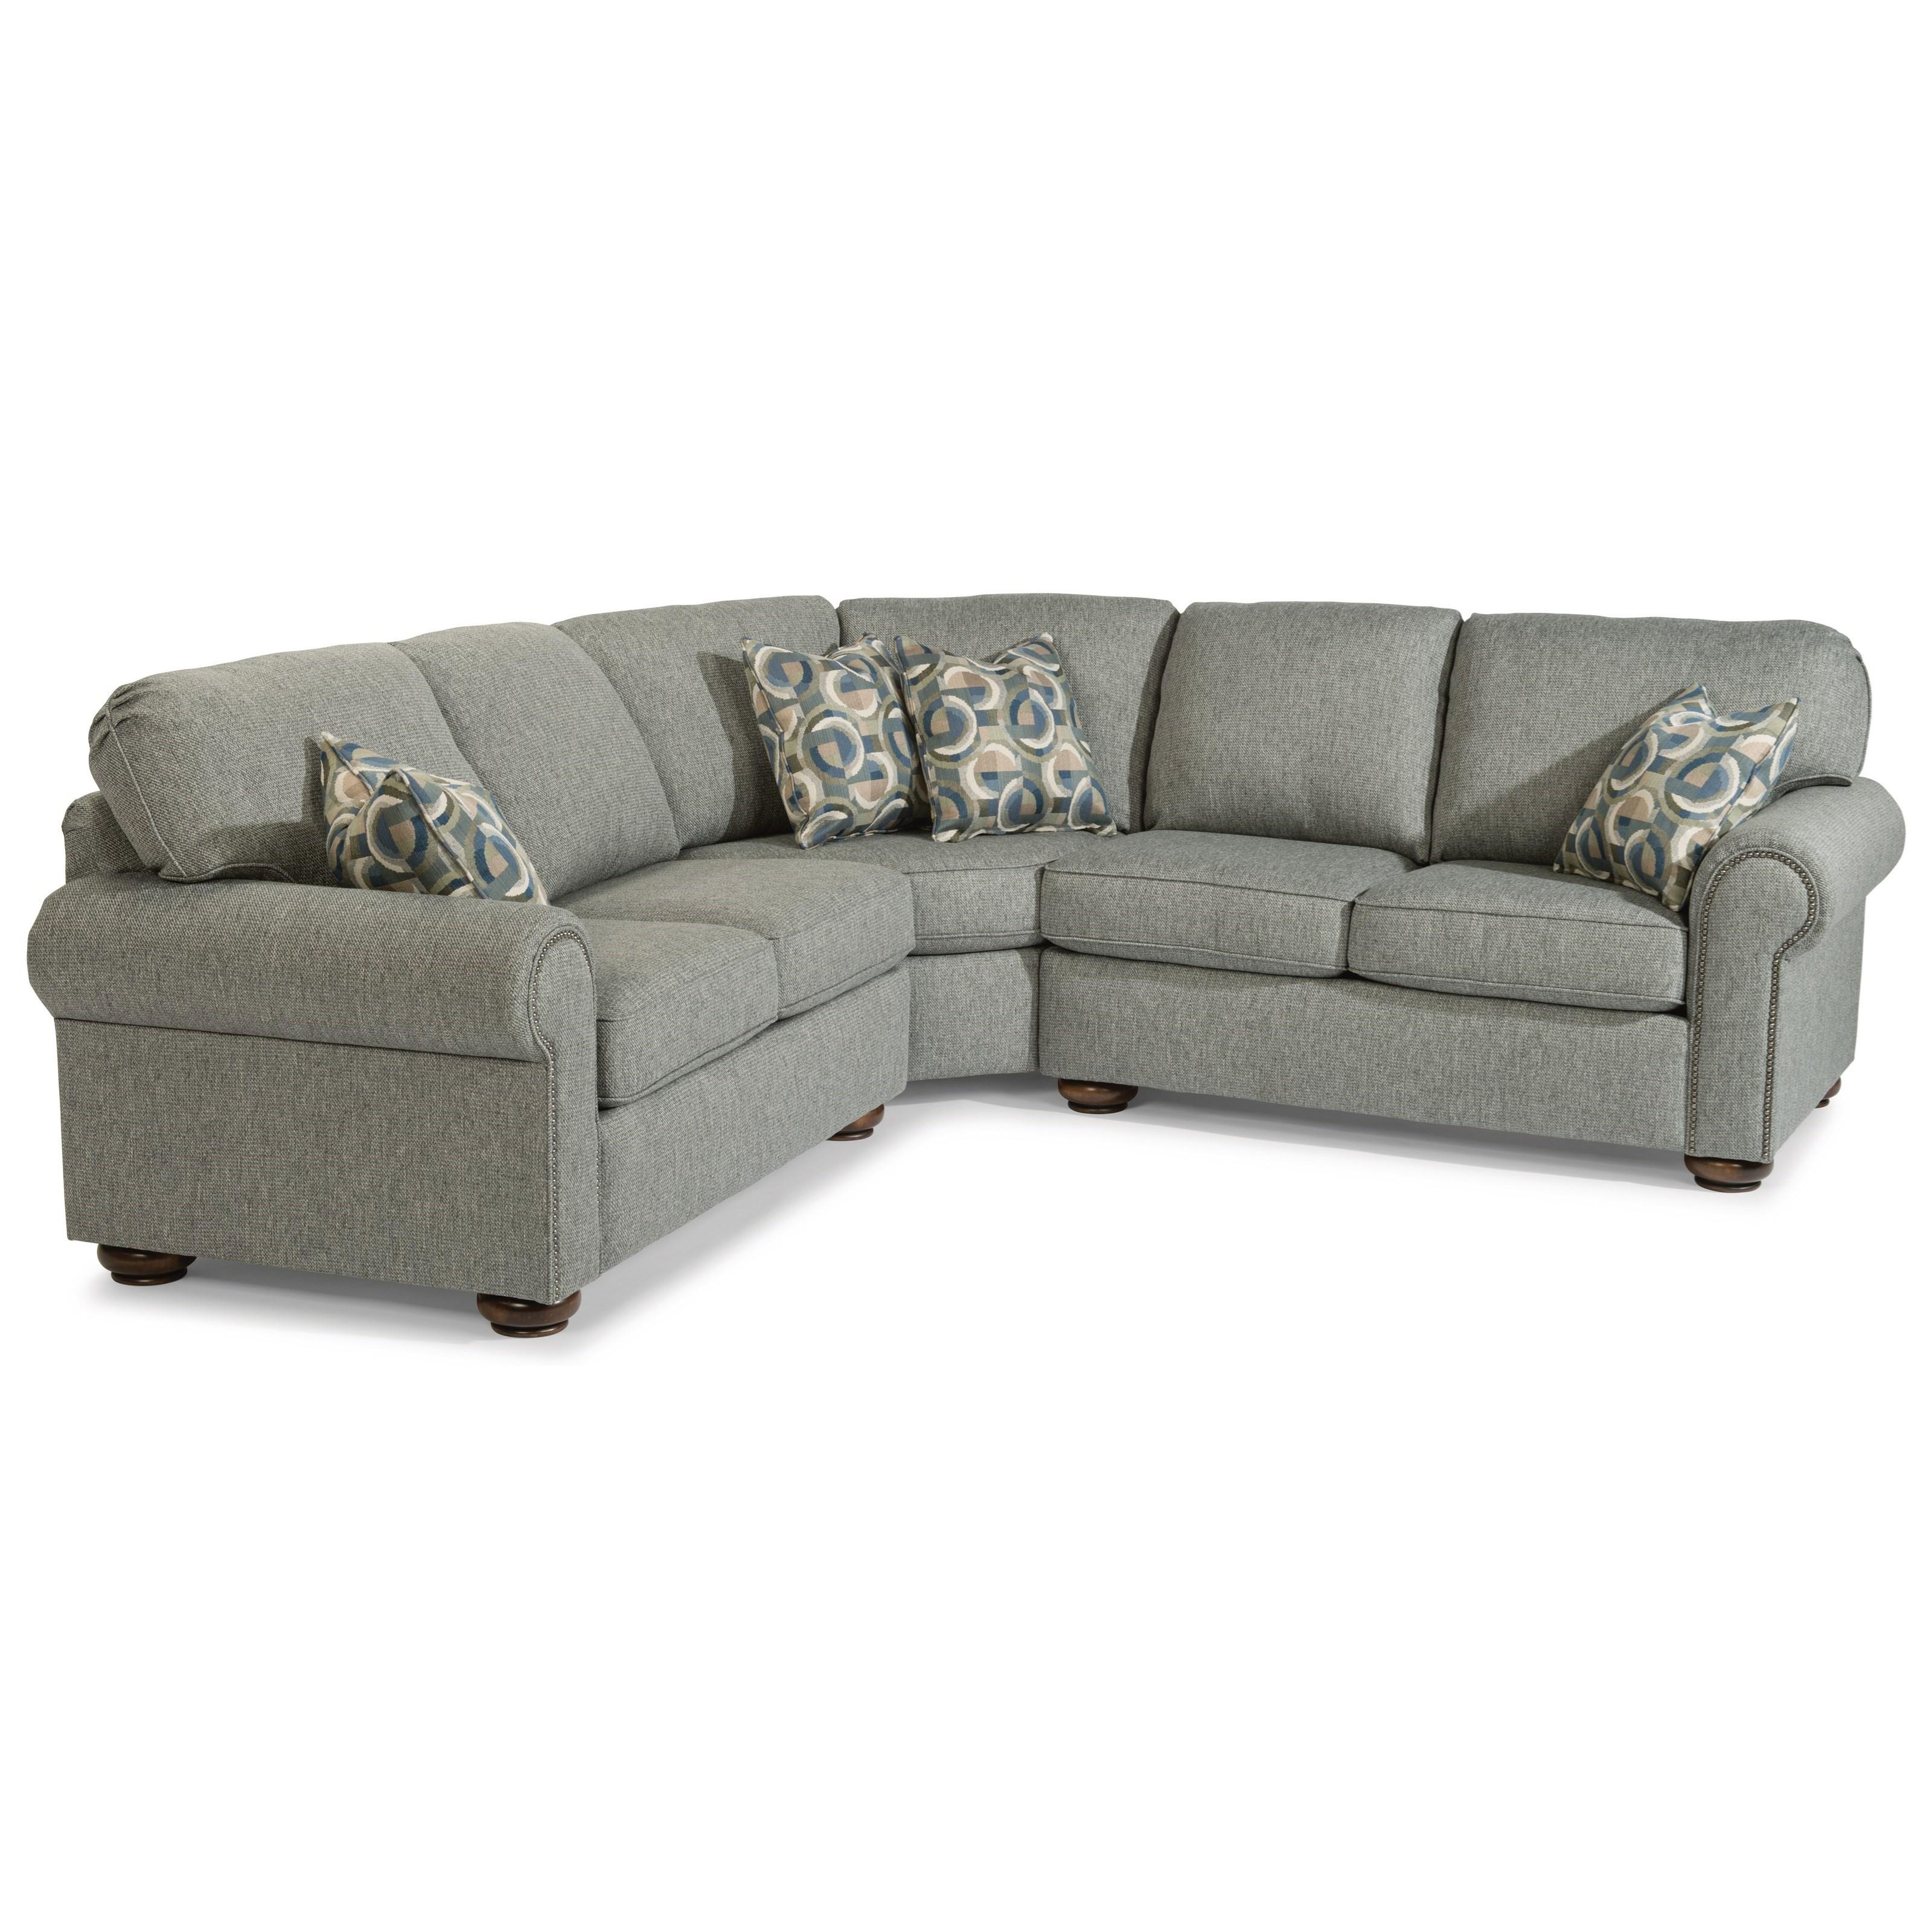 Superieur Flexsteel Preston Traditional 4 Seat Sectional Sofa With Nailhead Trim